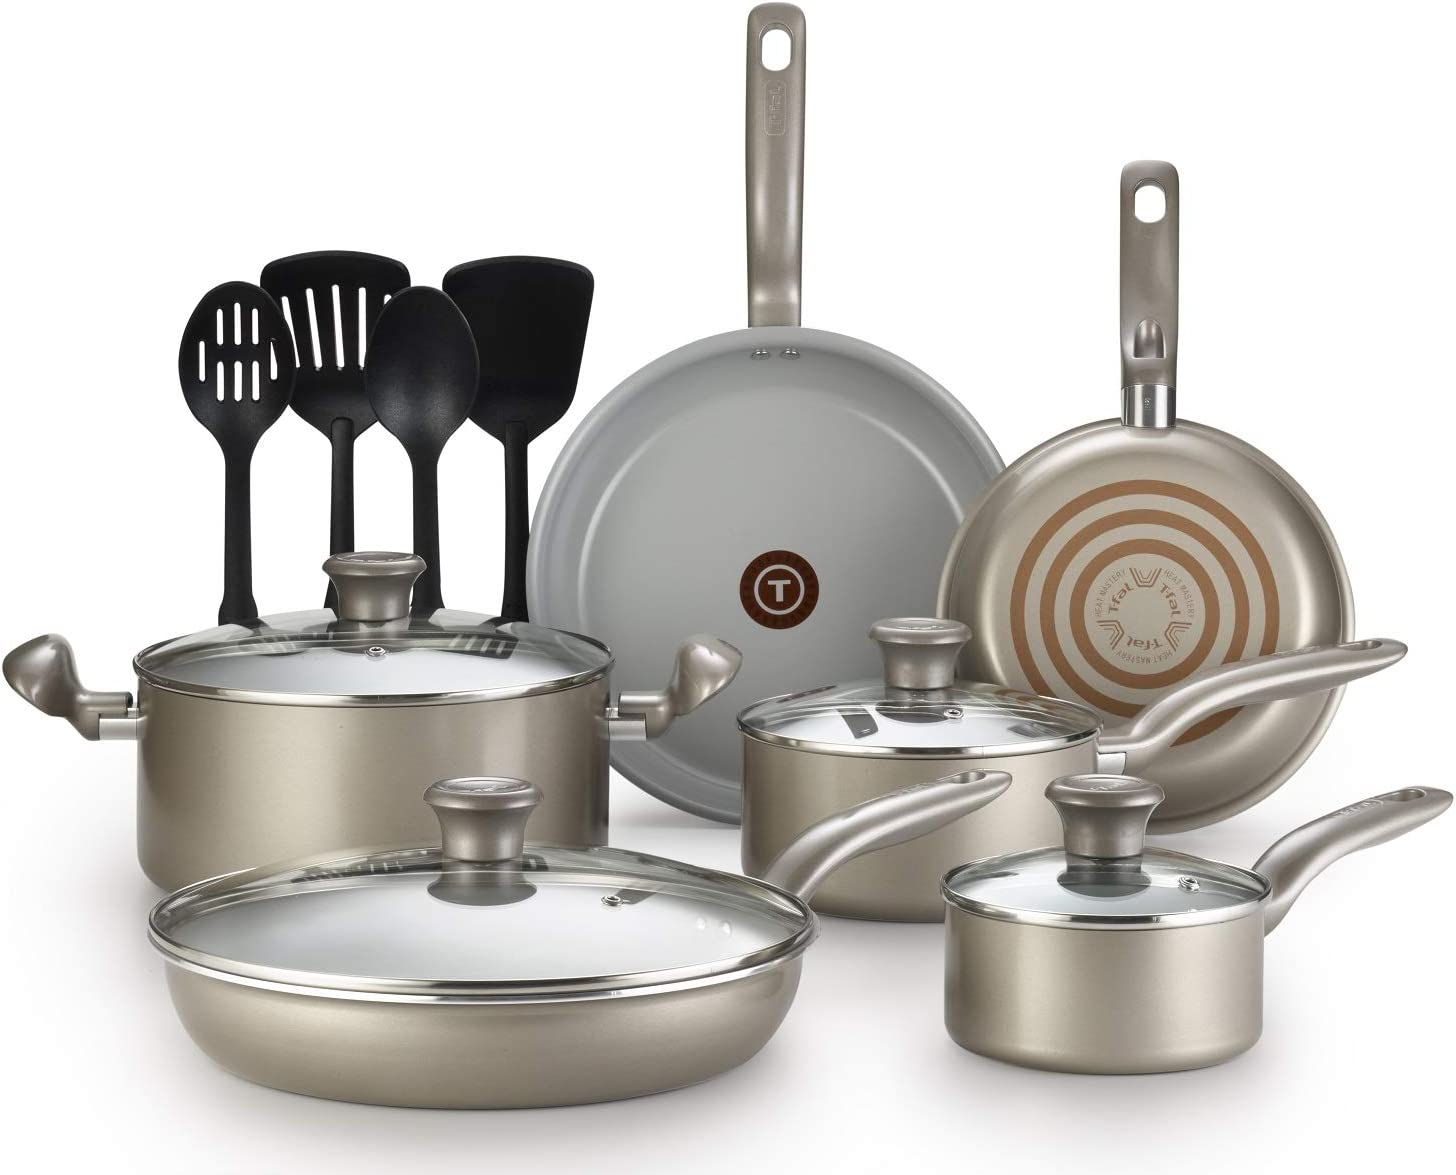 T-fal G919SE64 Initiatives Ceramic Nonstick Dishwasher Safe Toxic Free 14-Piece Cookware Set, Gold: Kitchen & Dining